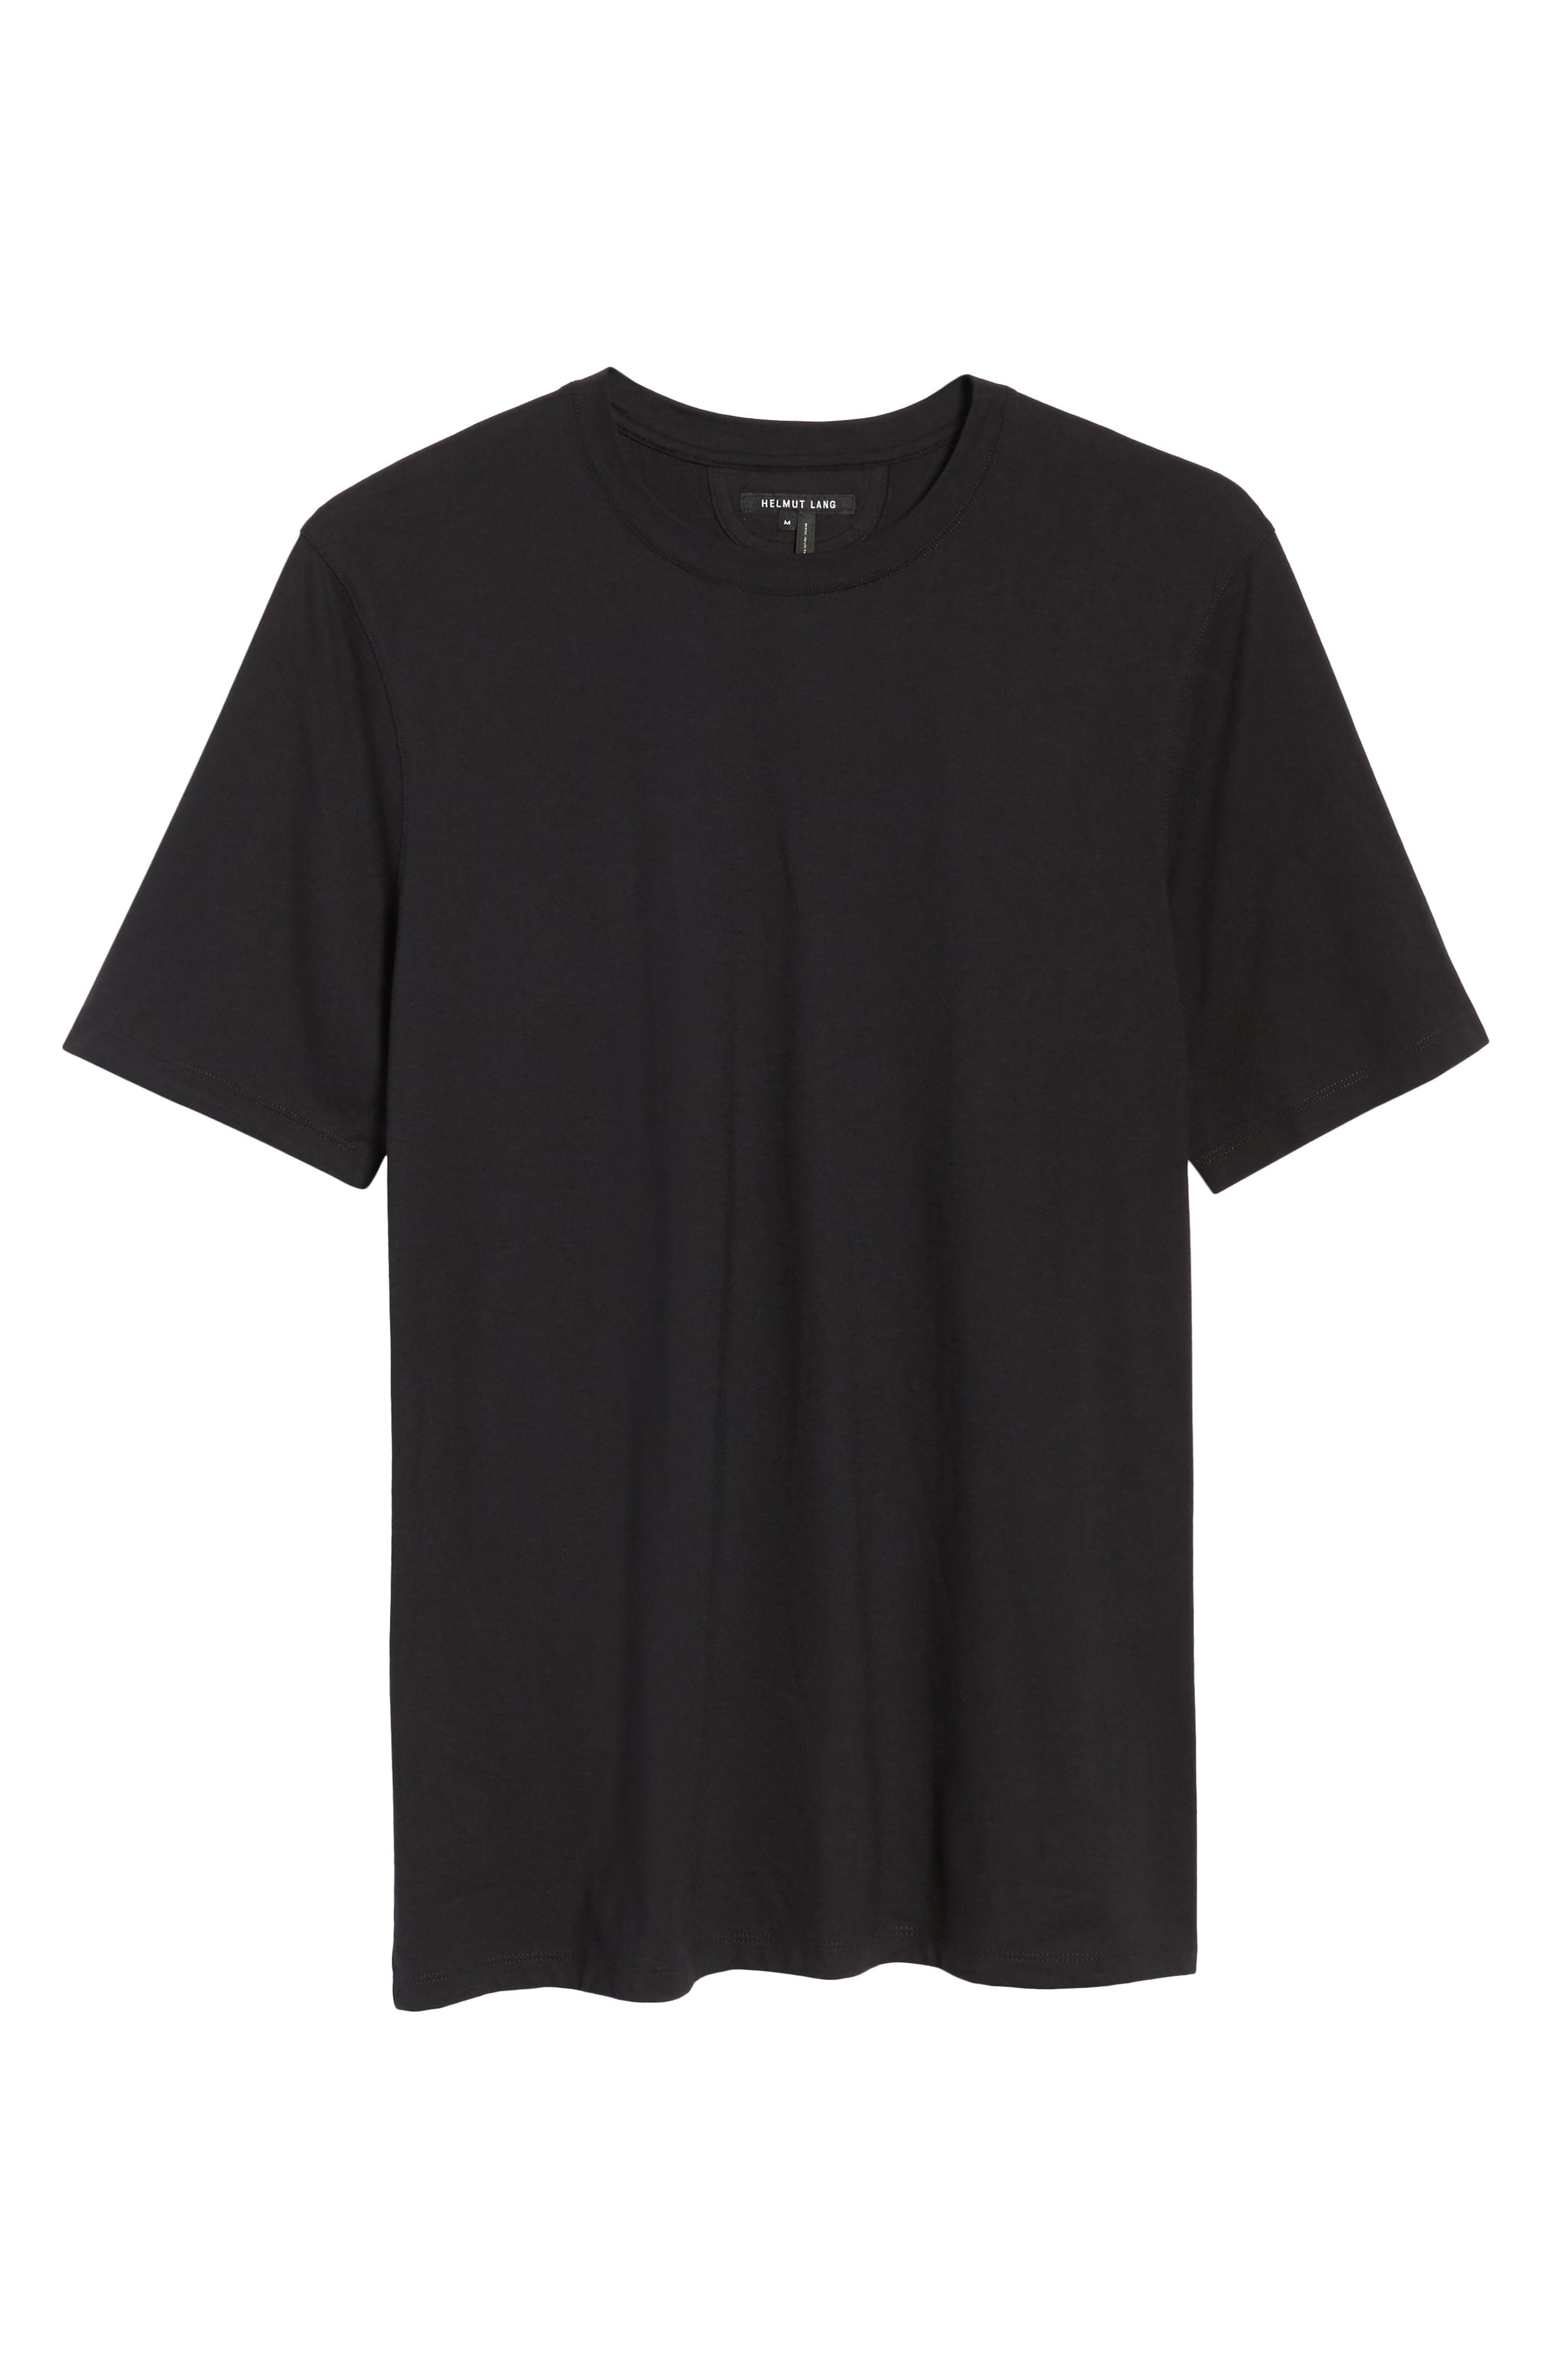 Heritage T-Shirt,                             Main thumbnail 1, color,                             001